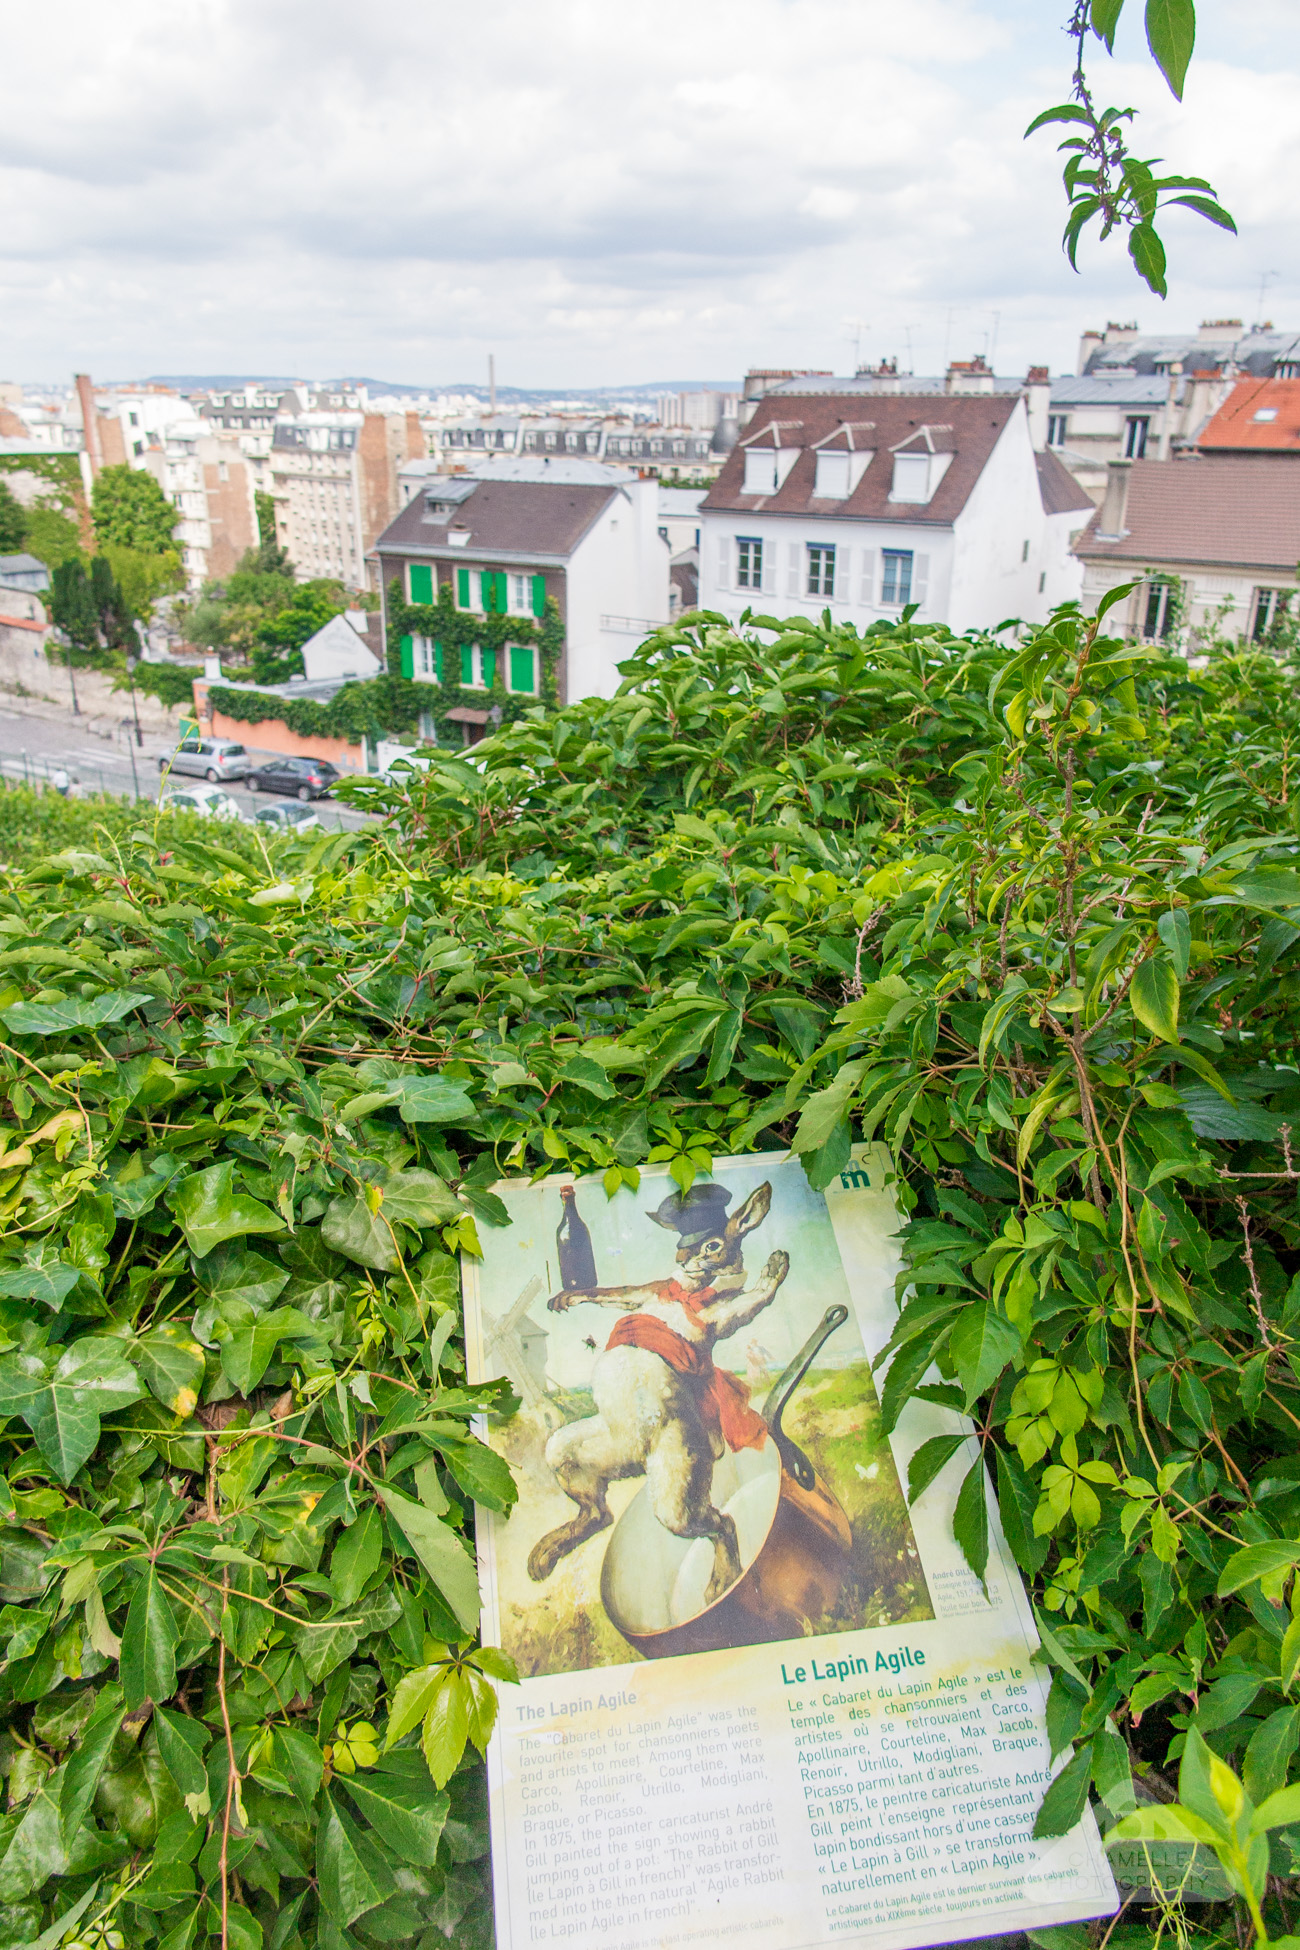 Musee Montmartre Museum film decor Paris France travel blog photography Lapin Agile